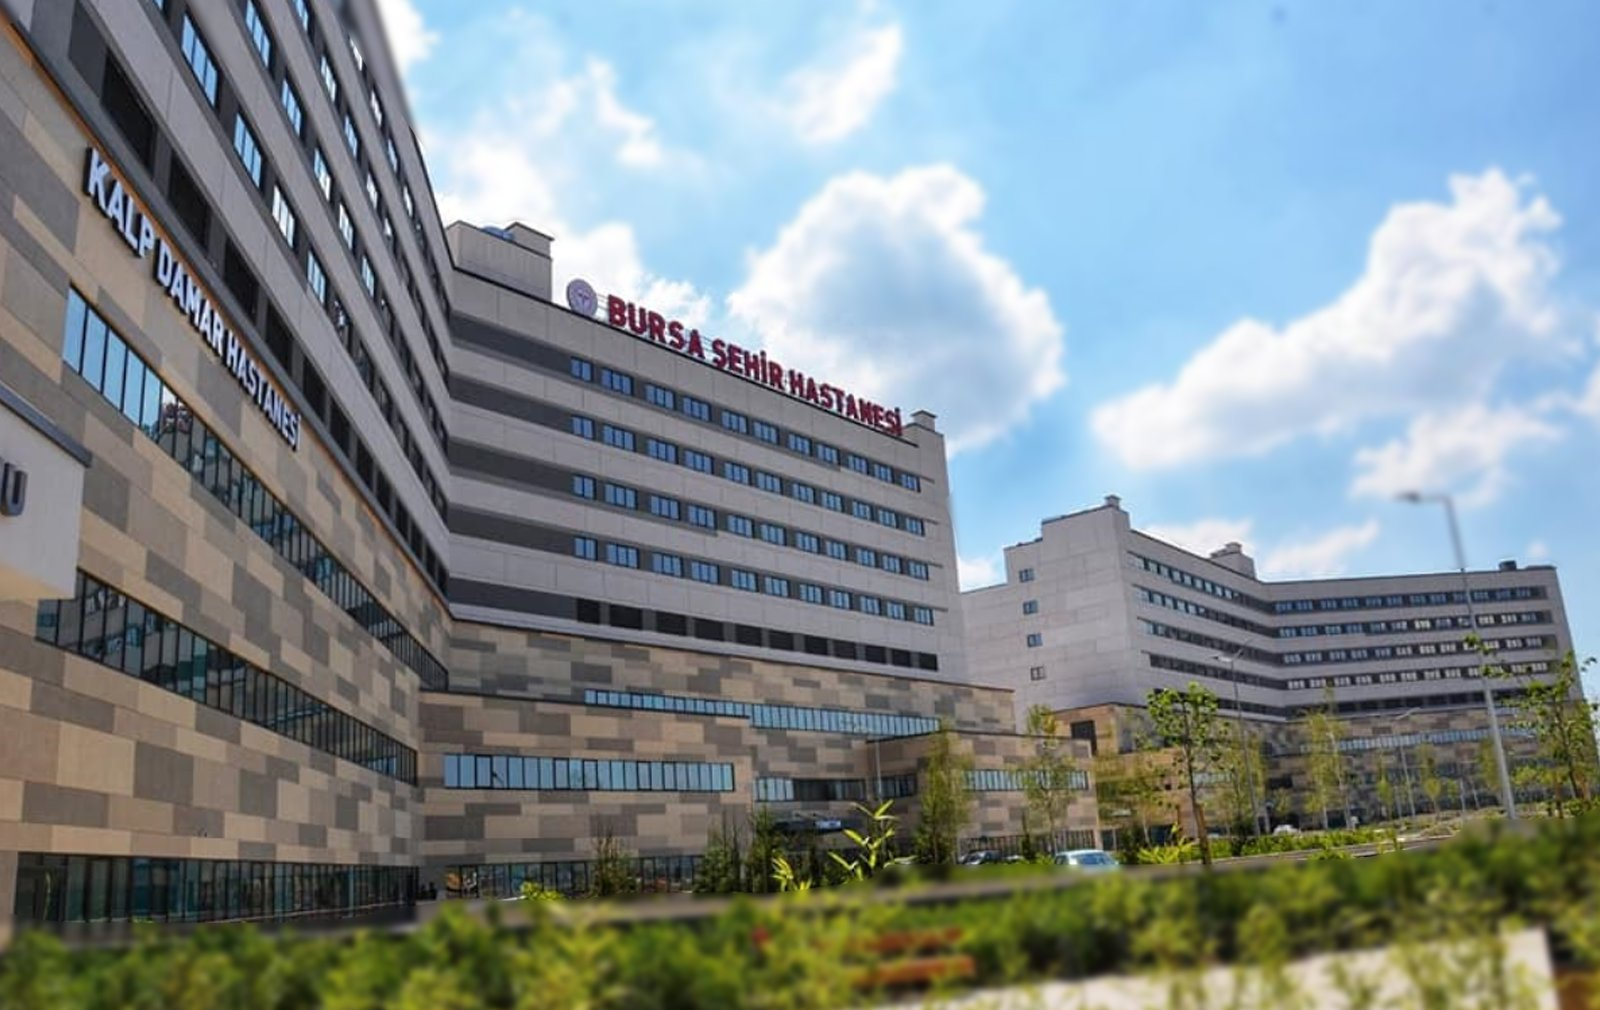 bursa sehir hastanesi